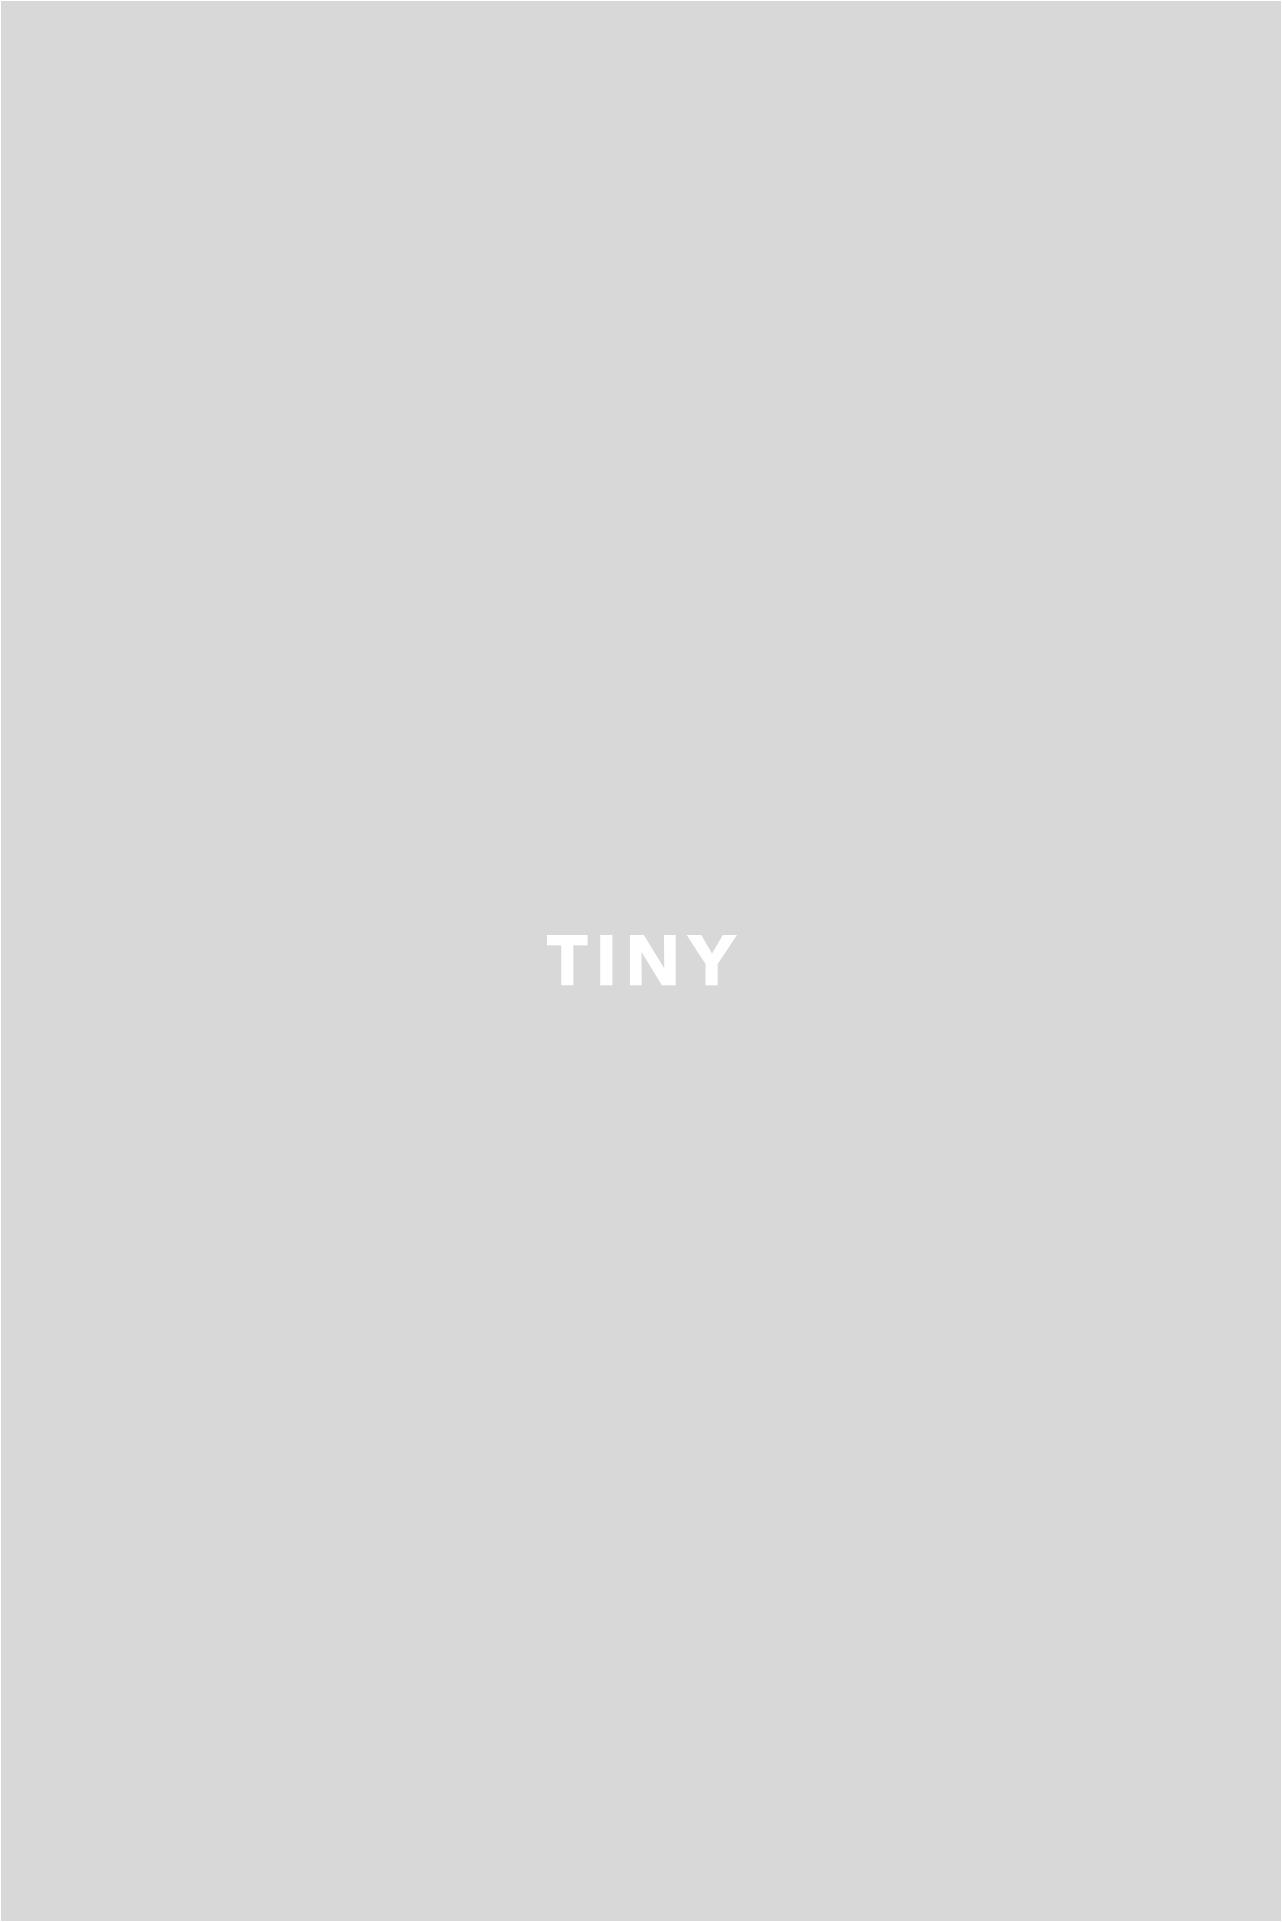 WORM DANCE SWEATSHIRT